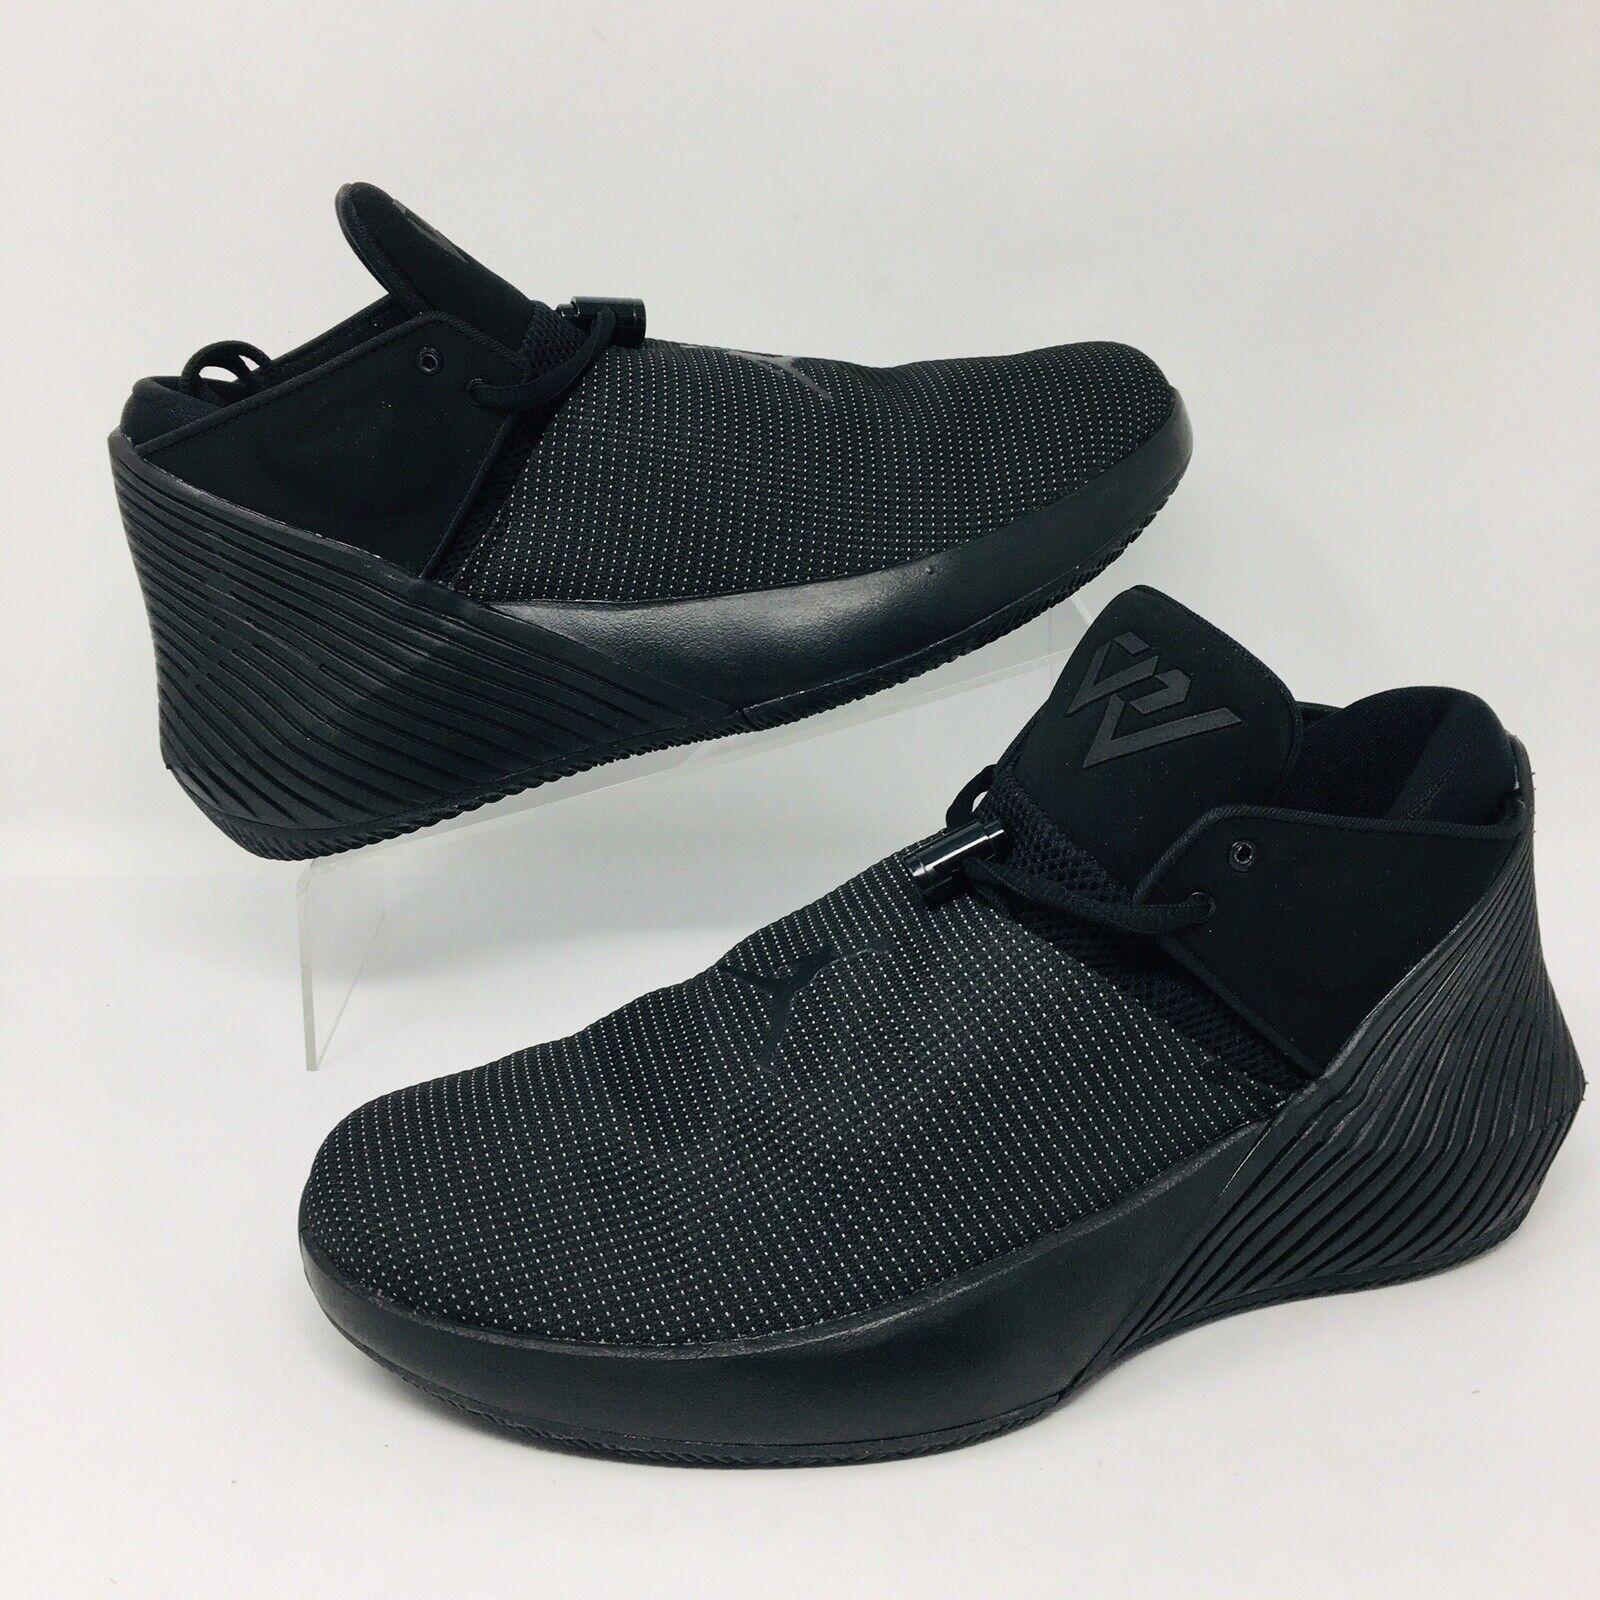 NEW Nike Air Jordan Why Not Zero.1 (Men Size 9.5) Basketball shoes Triple Black